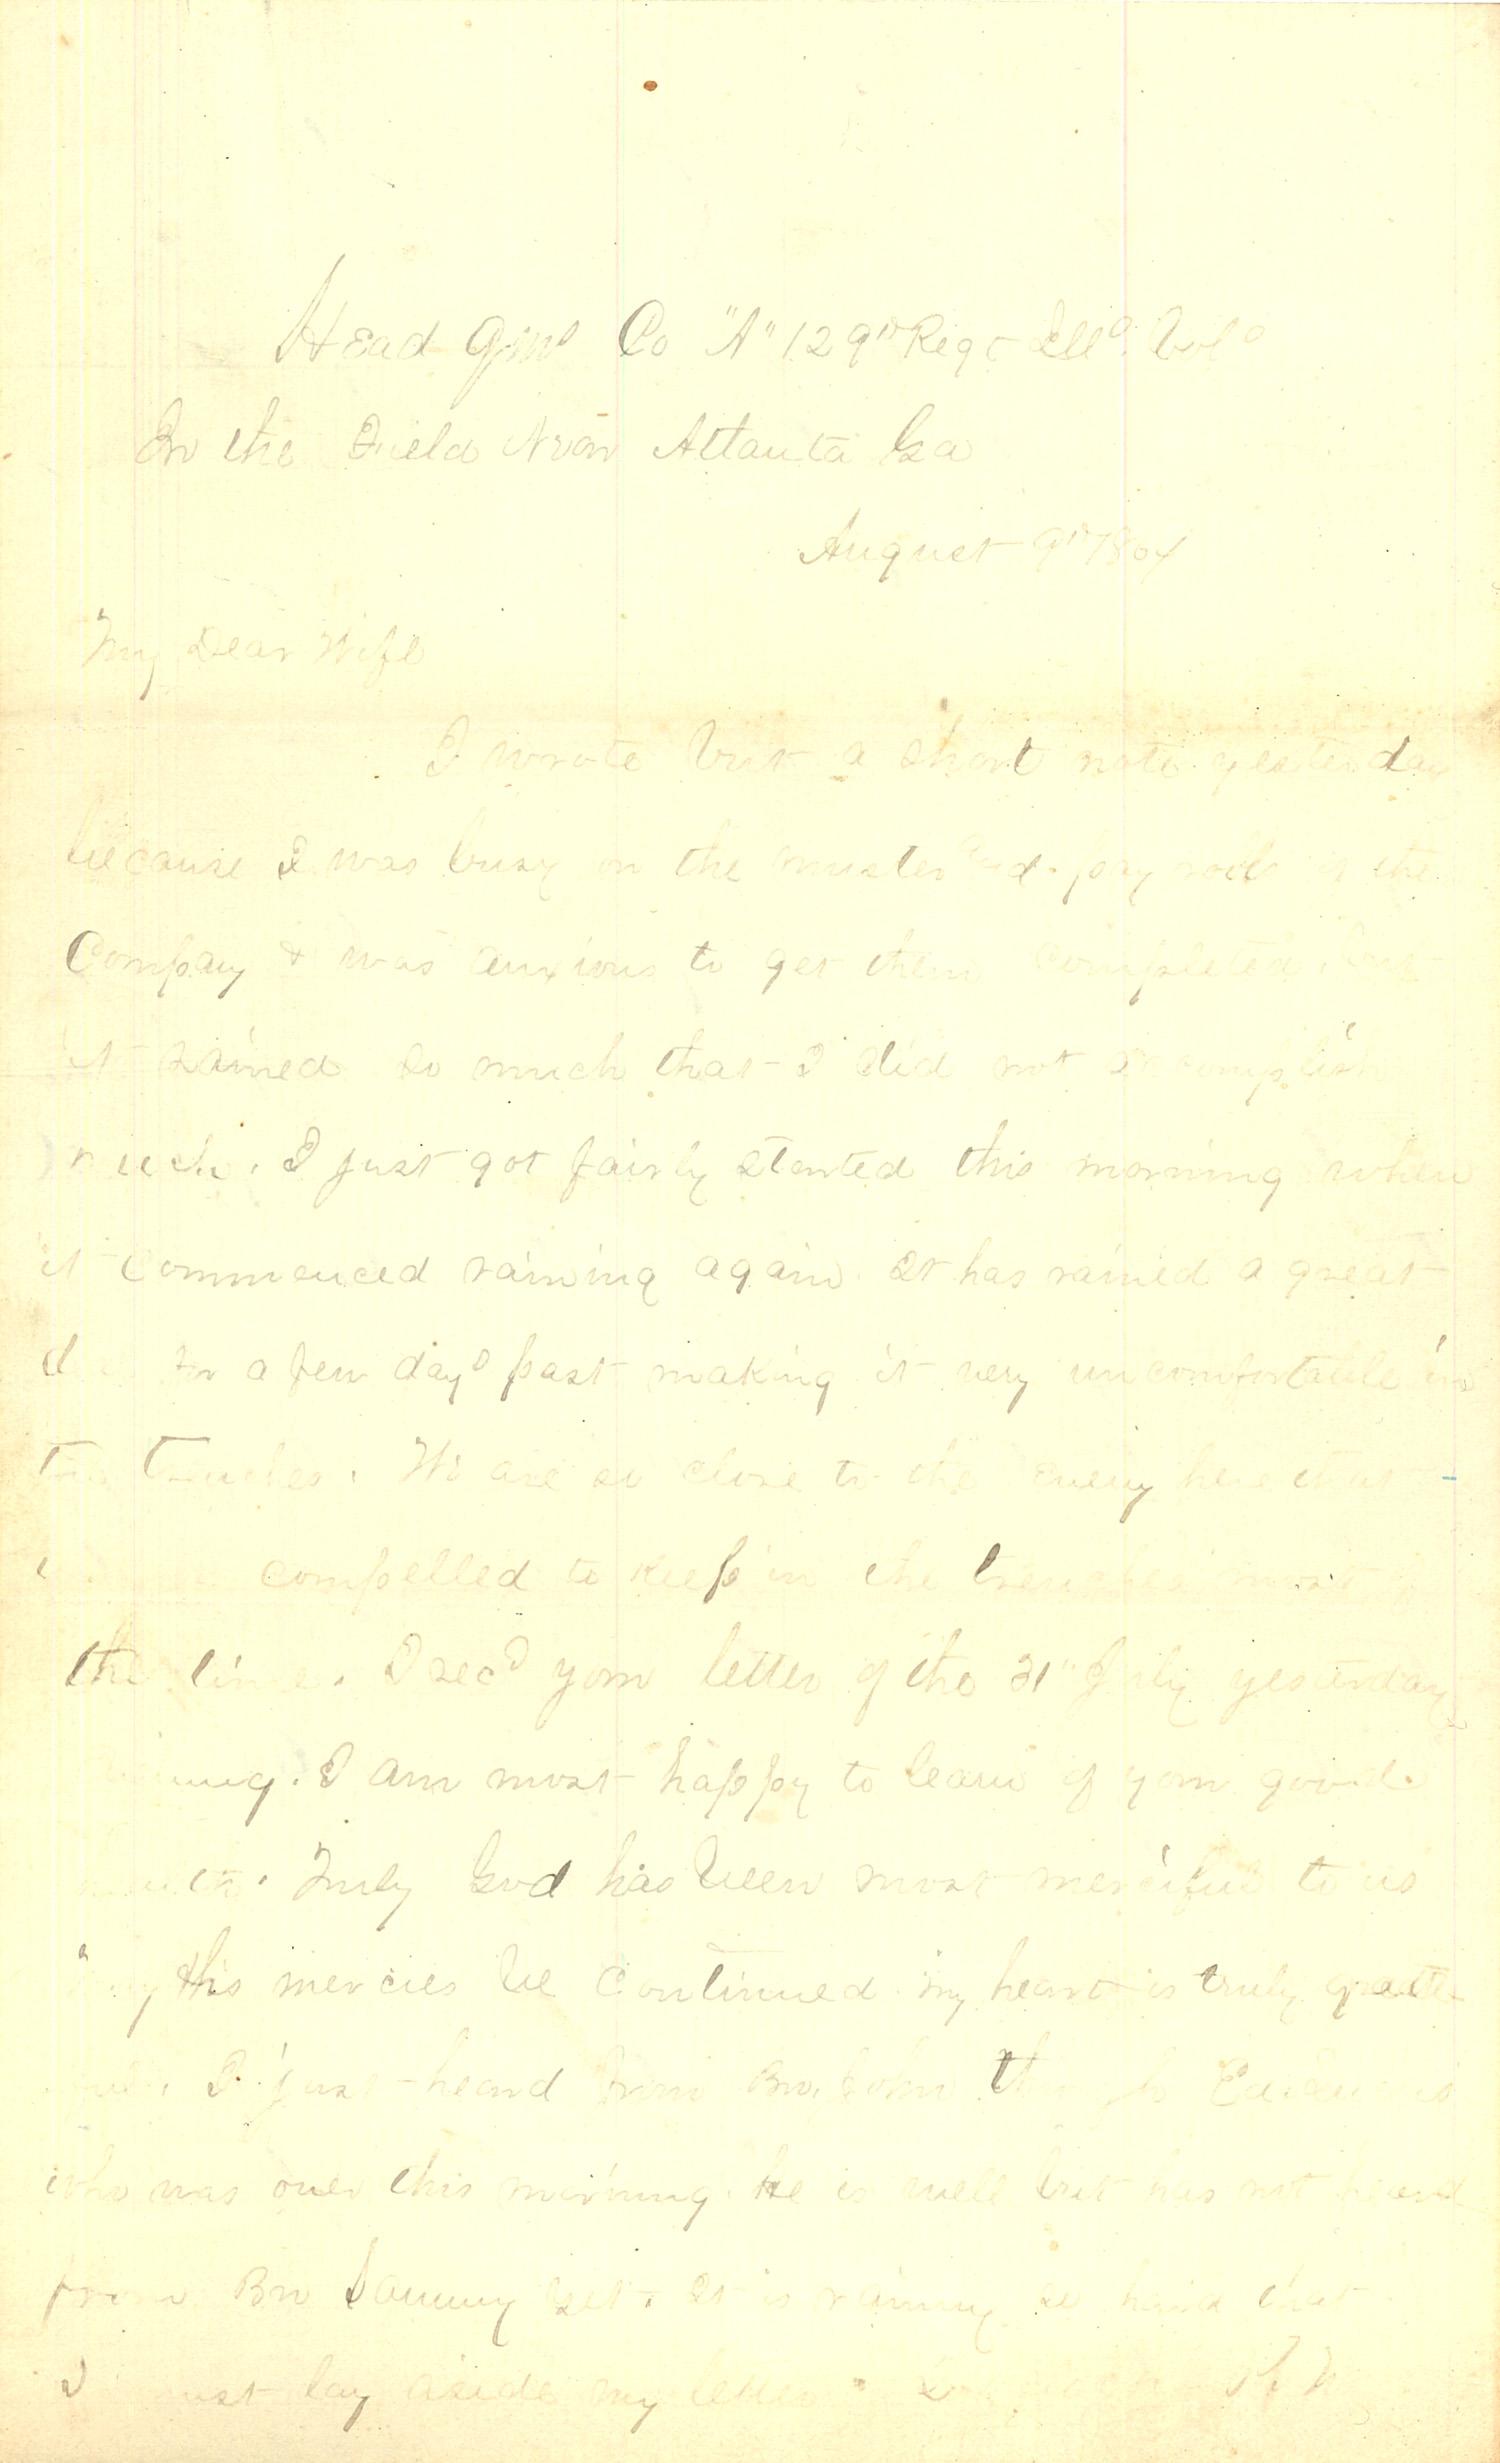 Joseph Culver Letter, August 9, 1864, Page 1